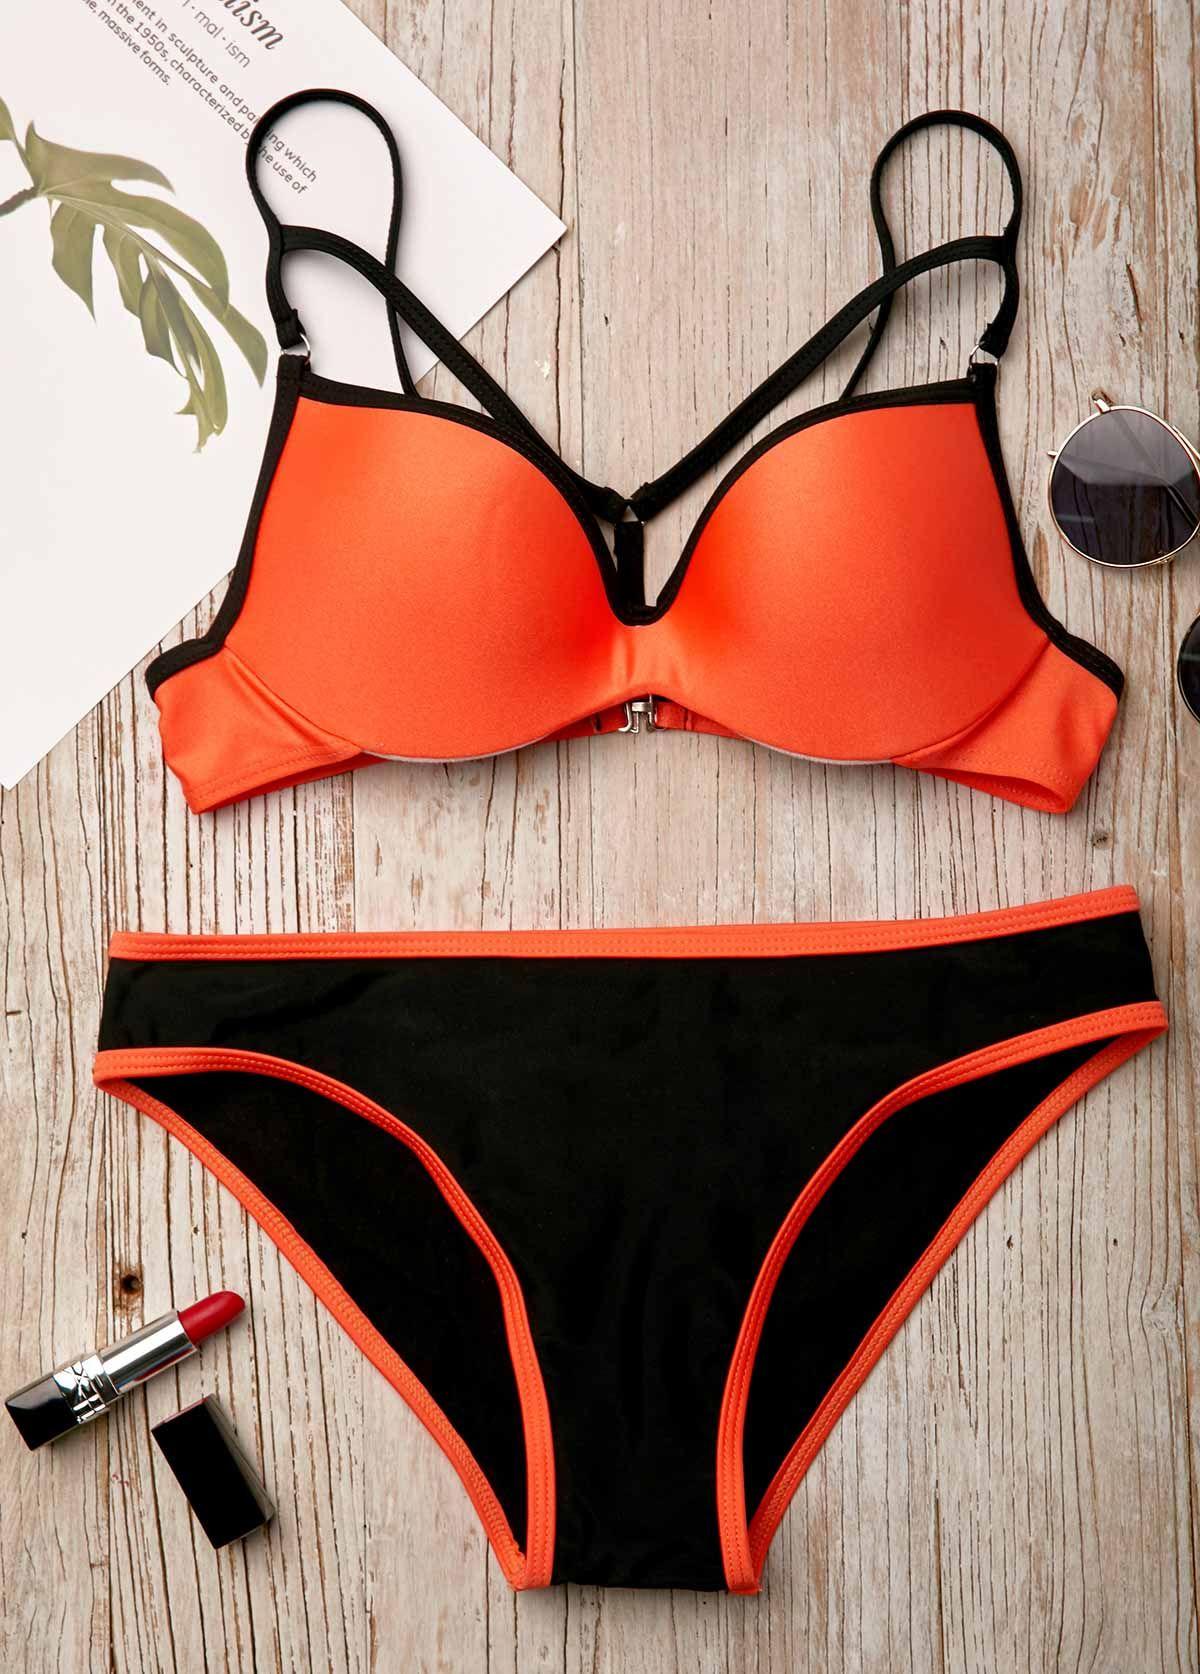 1ef3d276f96ec Spaghetti Strap Contrast Binding Orange Bikini Set   Rosewe.com - USD $28.10